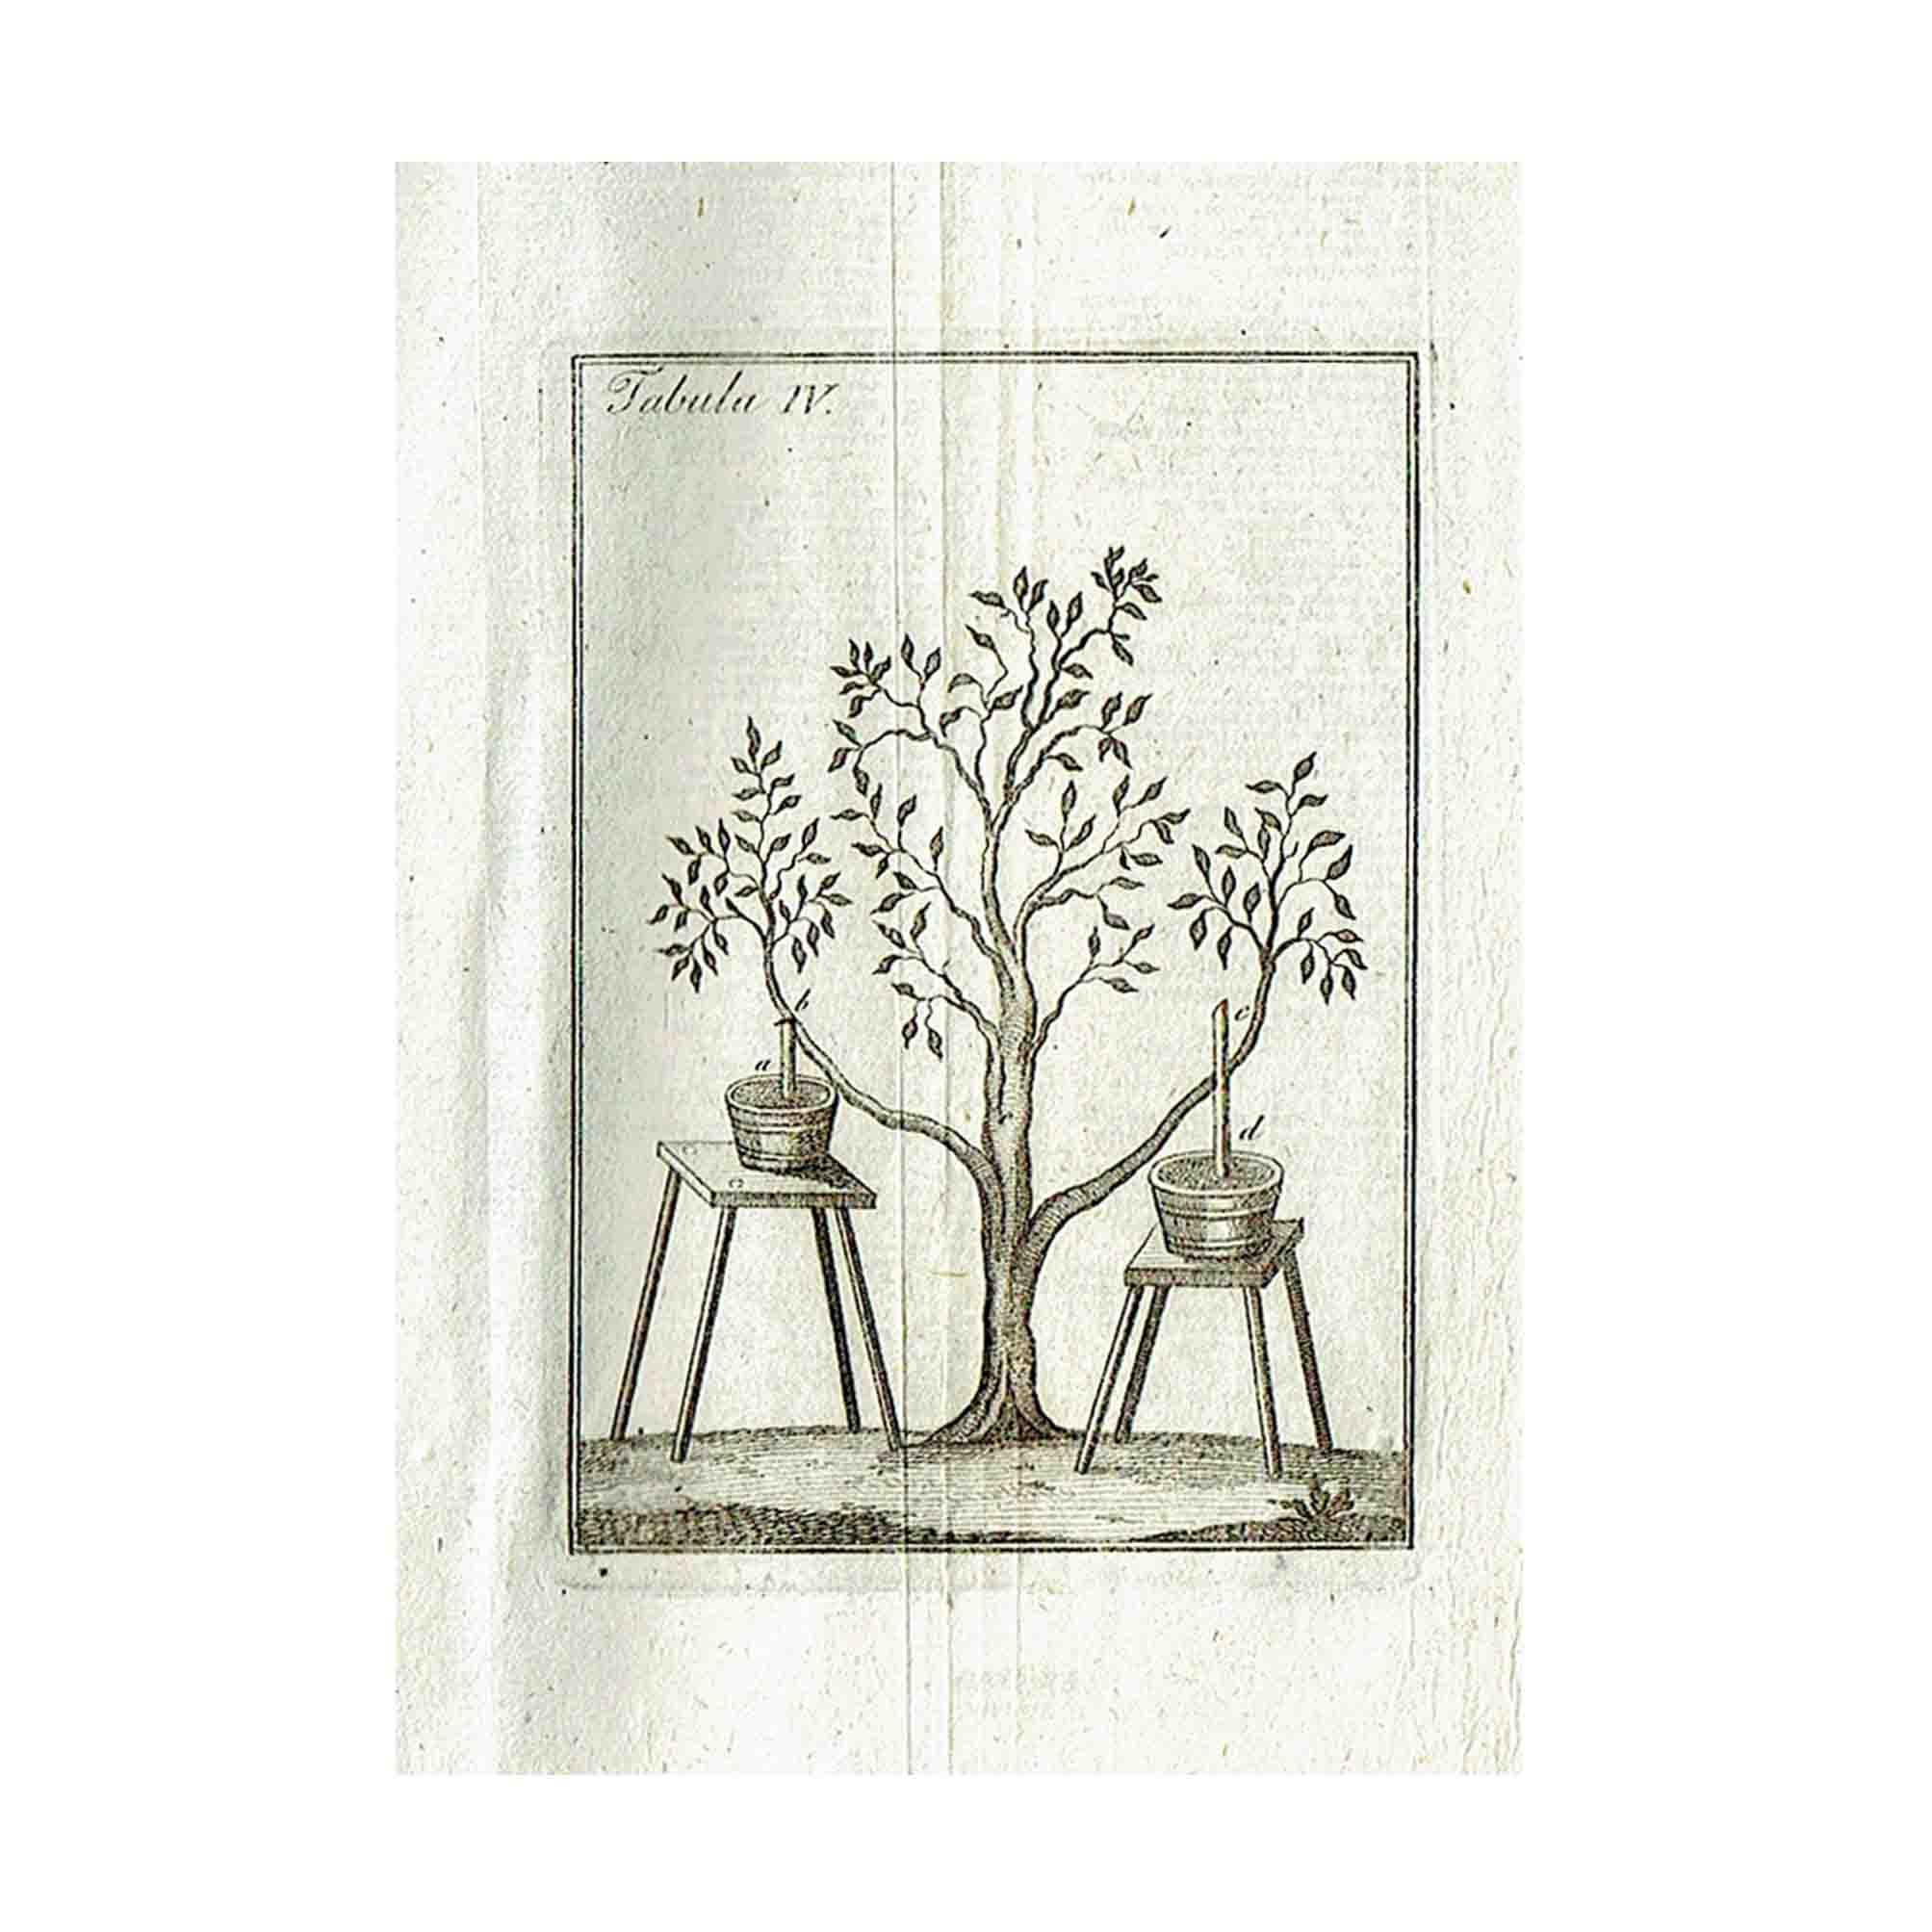 5948-Schmidt-Obstbaumgaertner-1827-Illustration-A-N.jpg